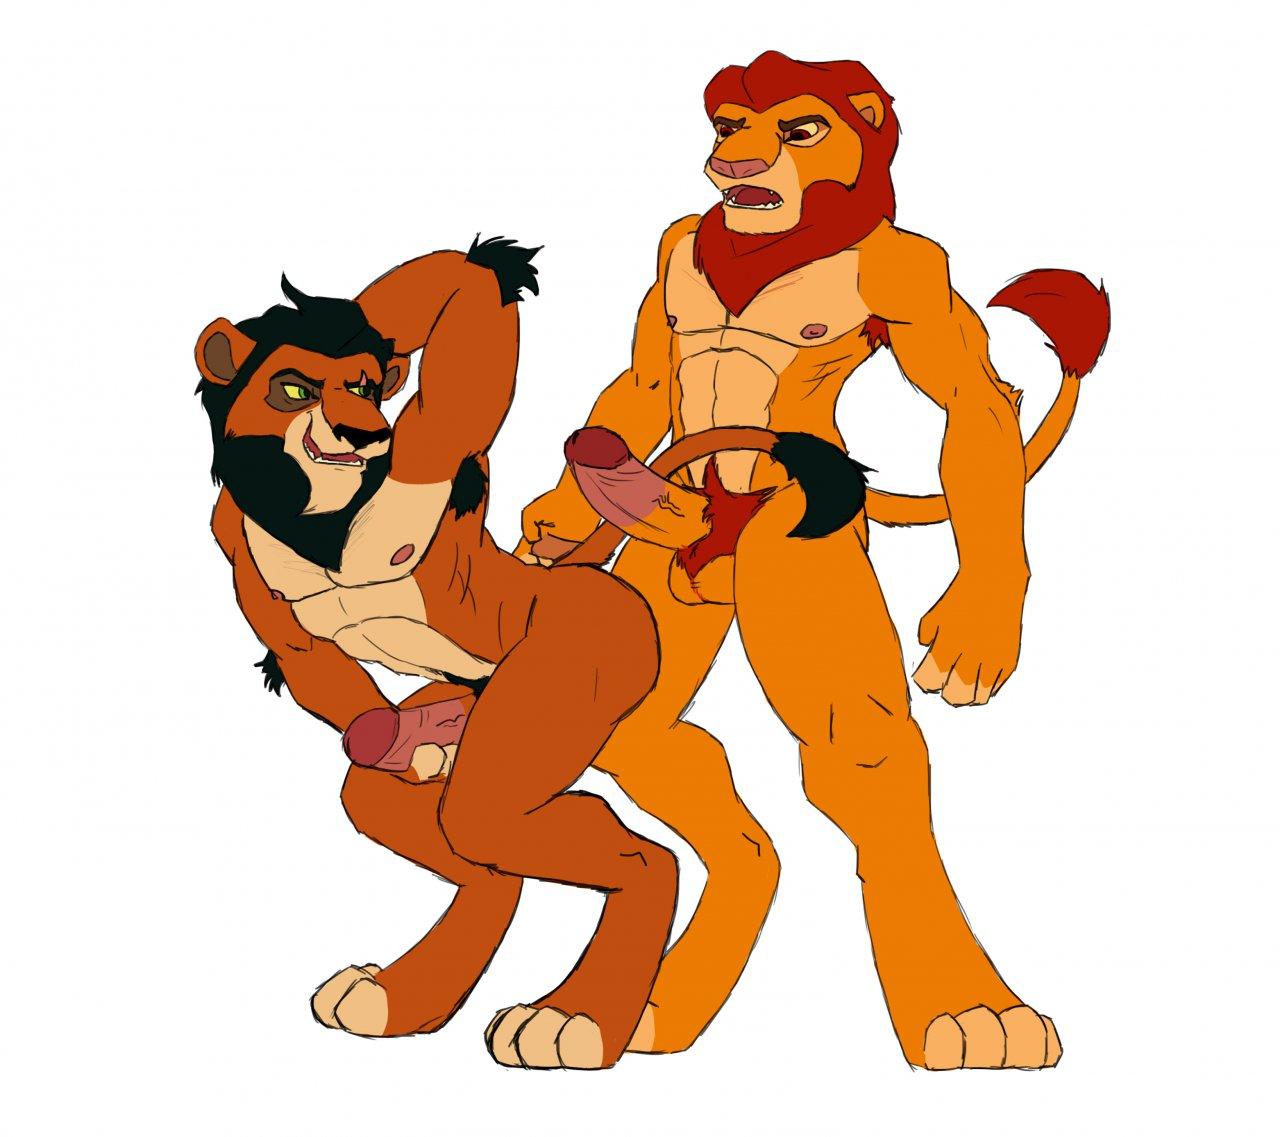 king lion the Futa taker pov